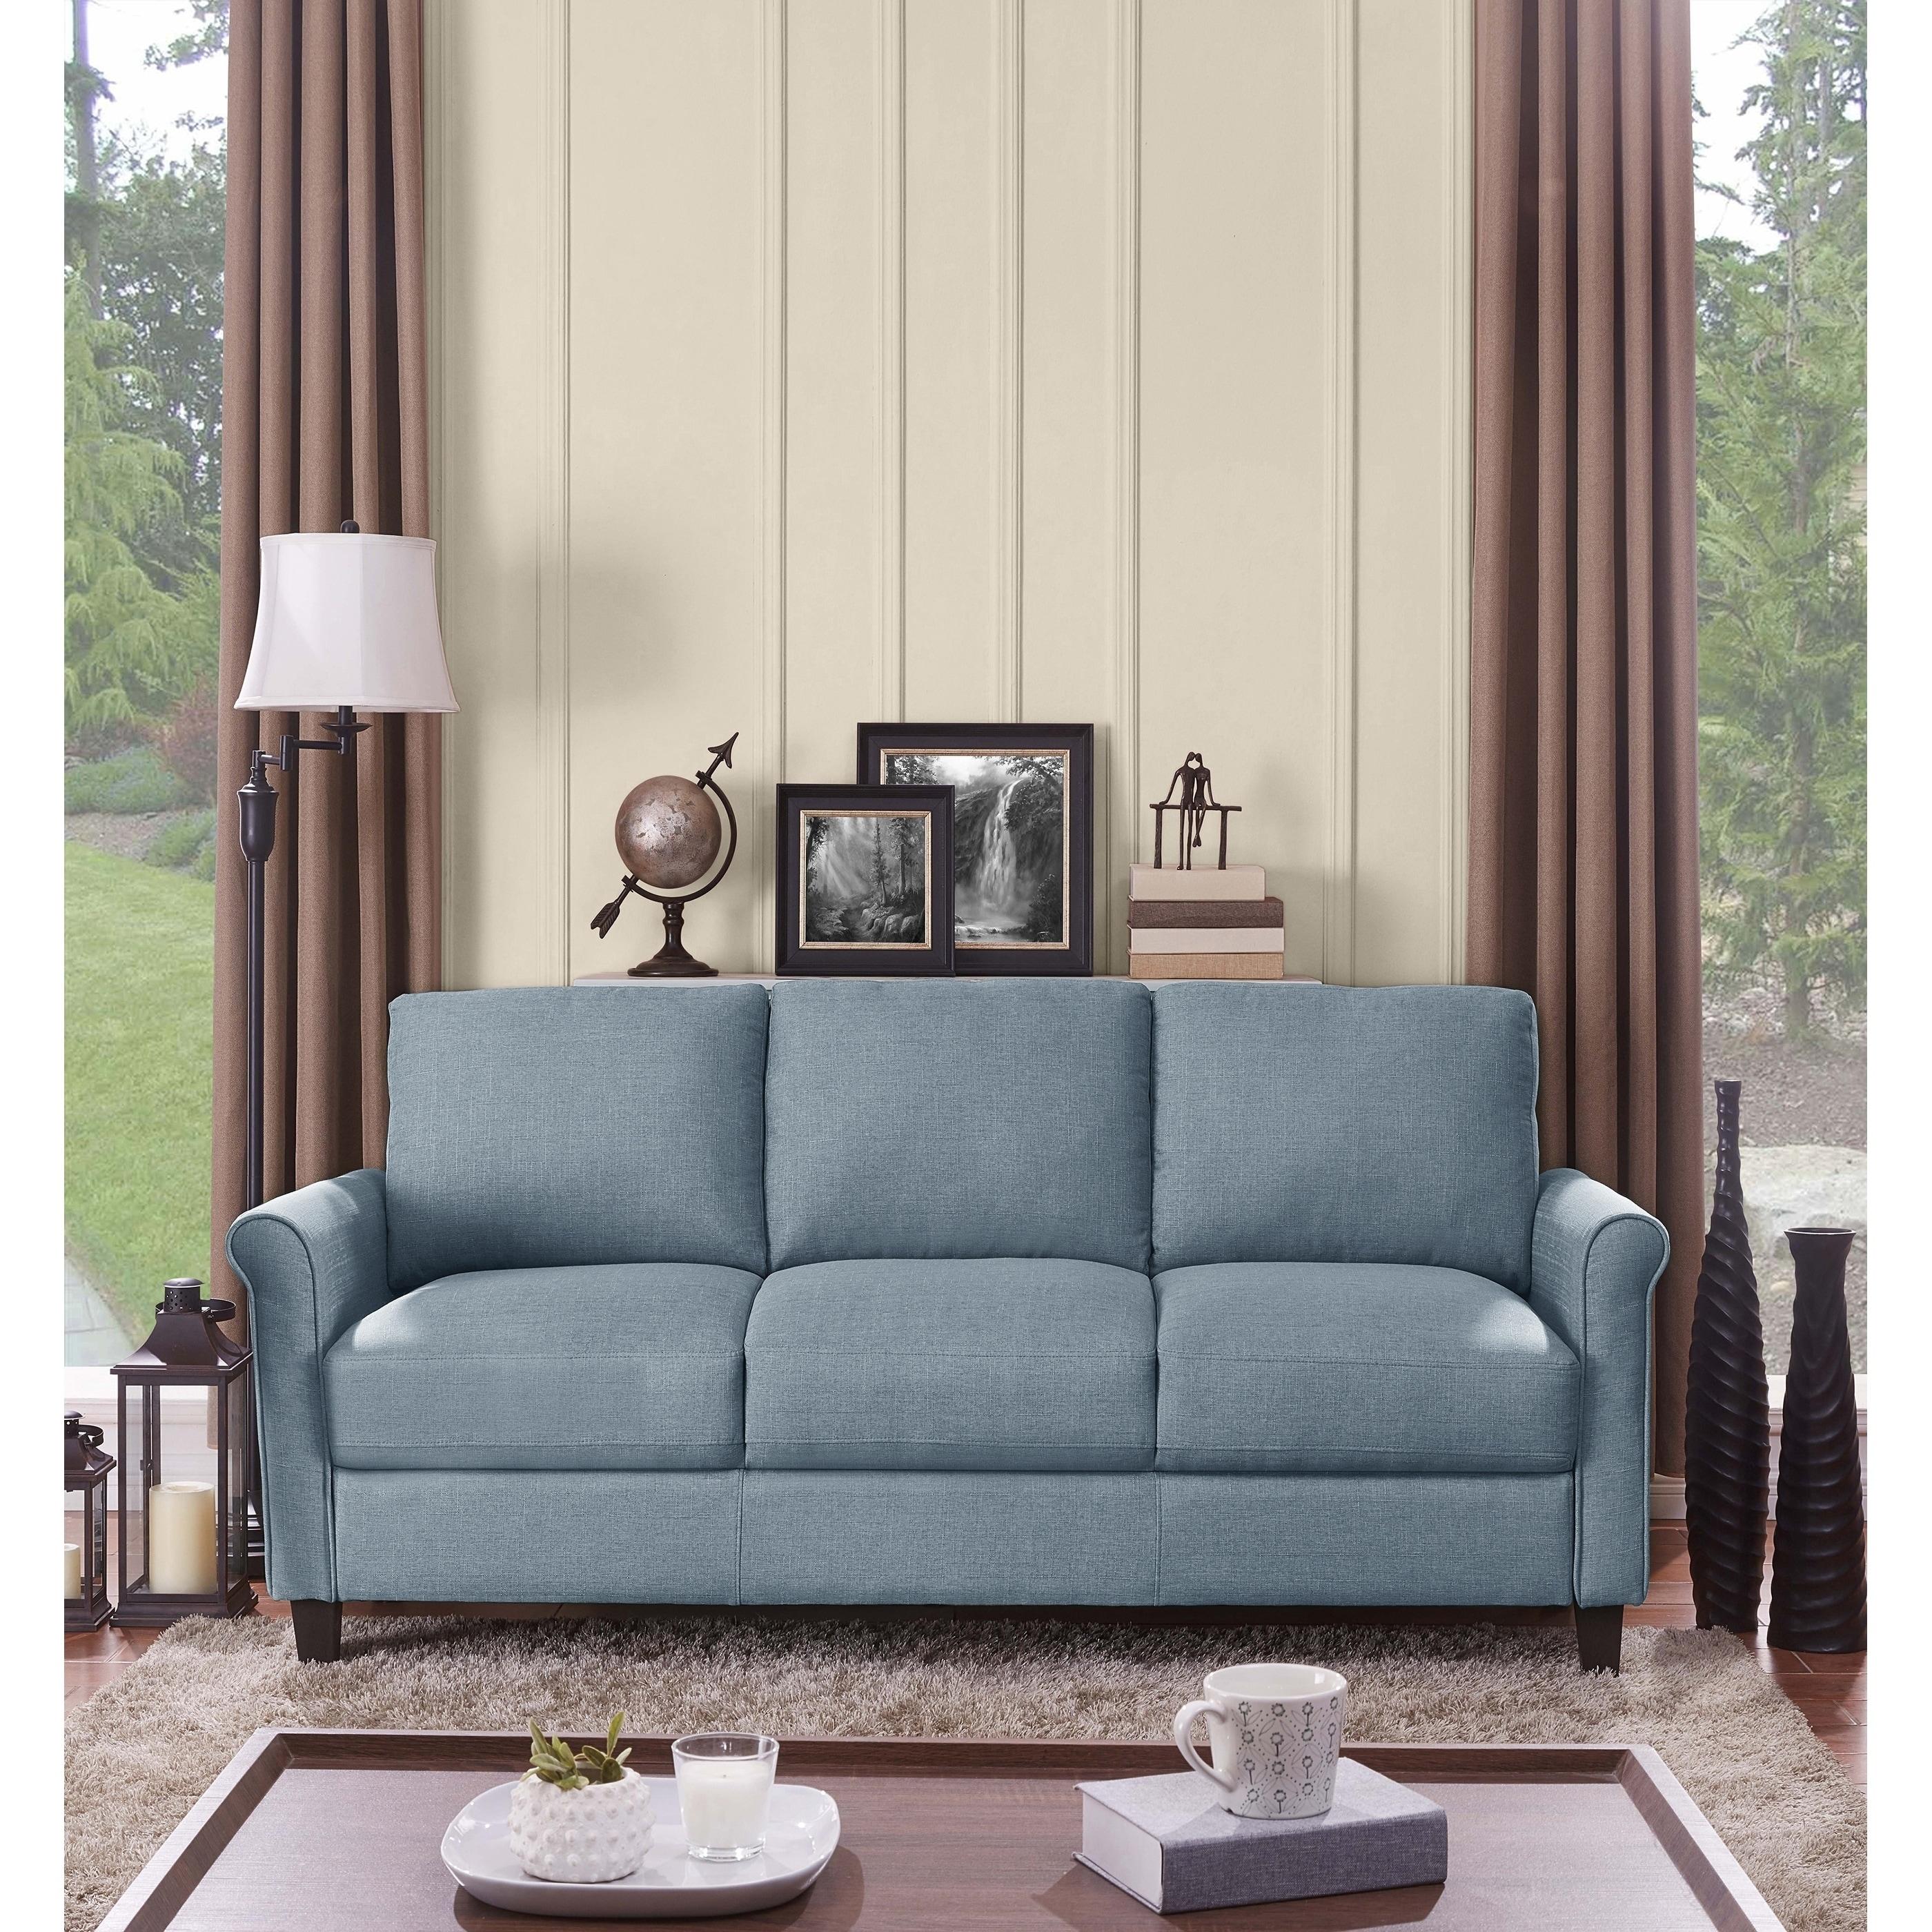 Admirable Handy Living Calhan Light Blue Textured Linen Sofa Andrewgaddart Wooden Chair Designs For Living Room Andrewgaddartcom